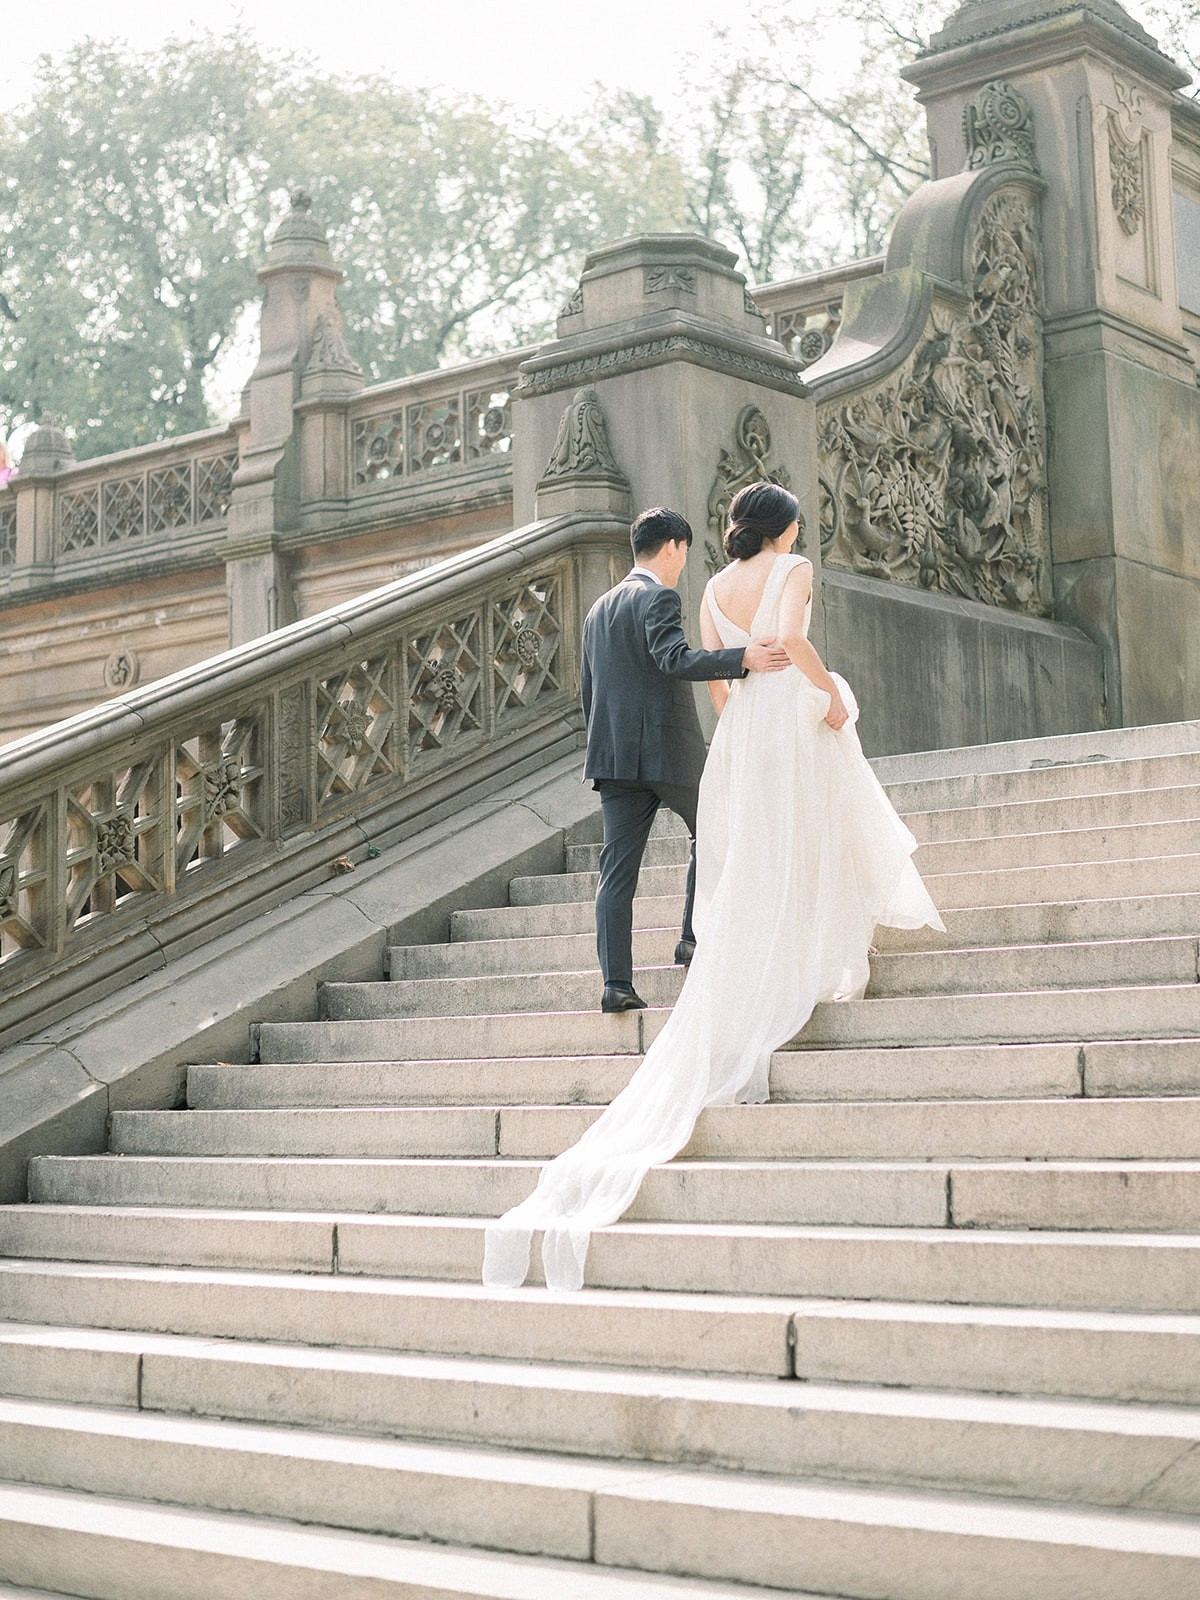 Pale Blue European Style Romance in New York City